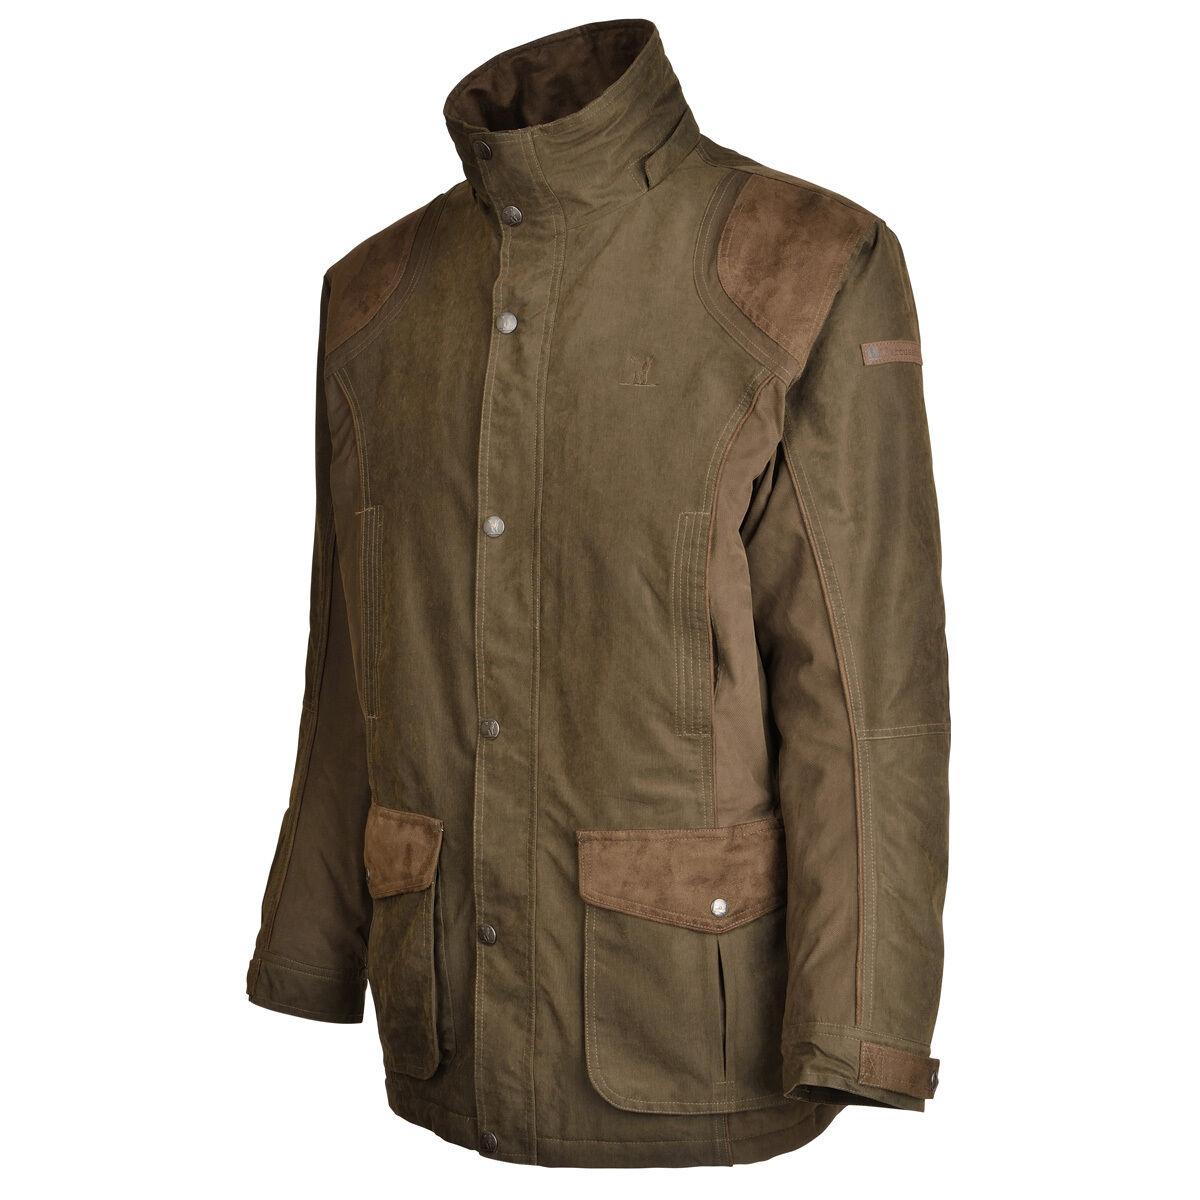 Rambouillet caza chaqueta-caqui verde disparar abrigo ropa de vestir impermeable